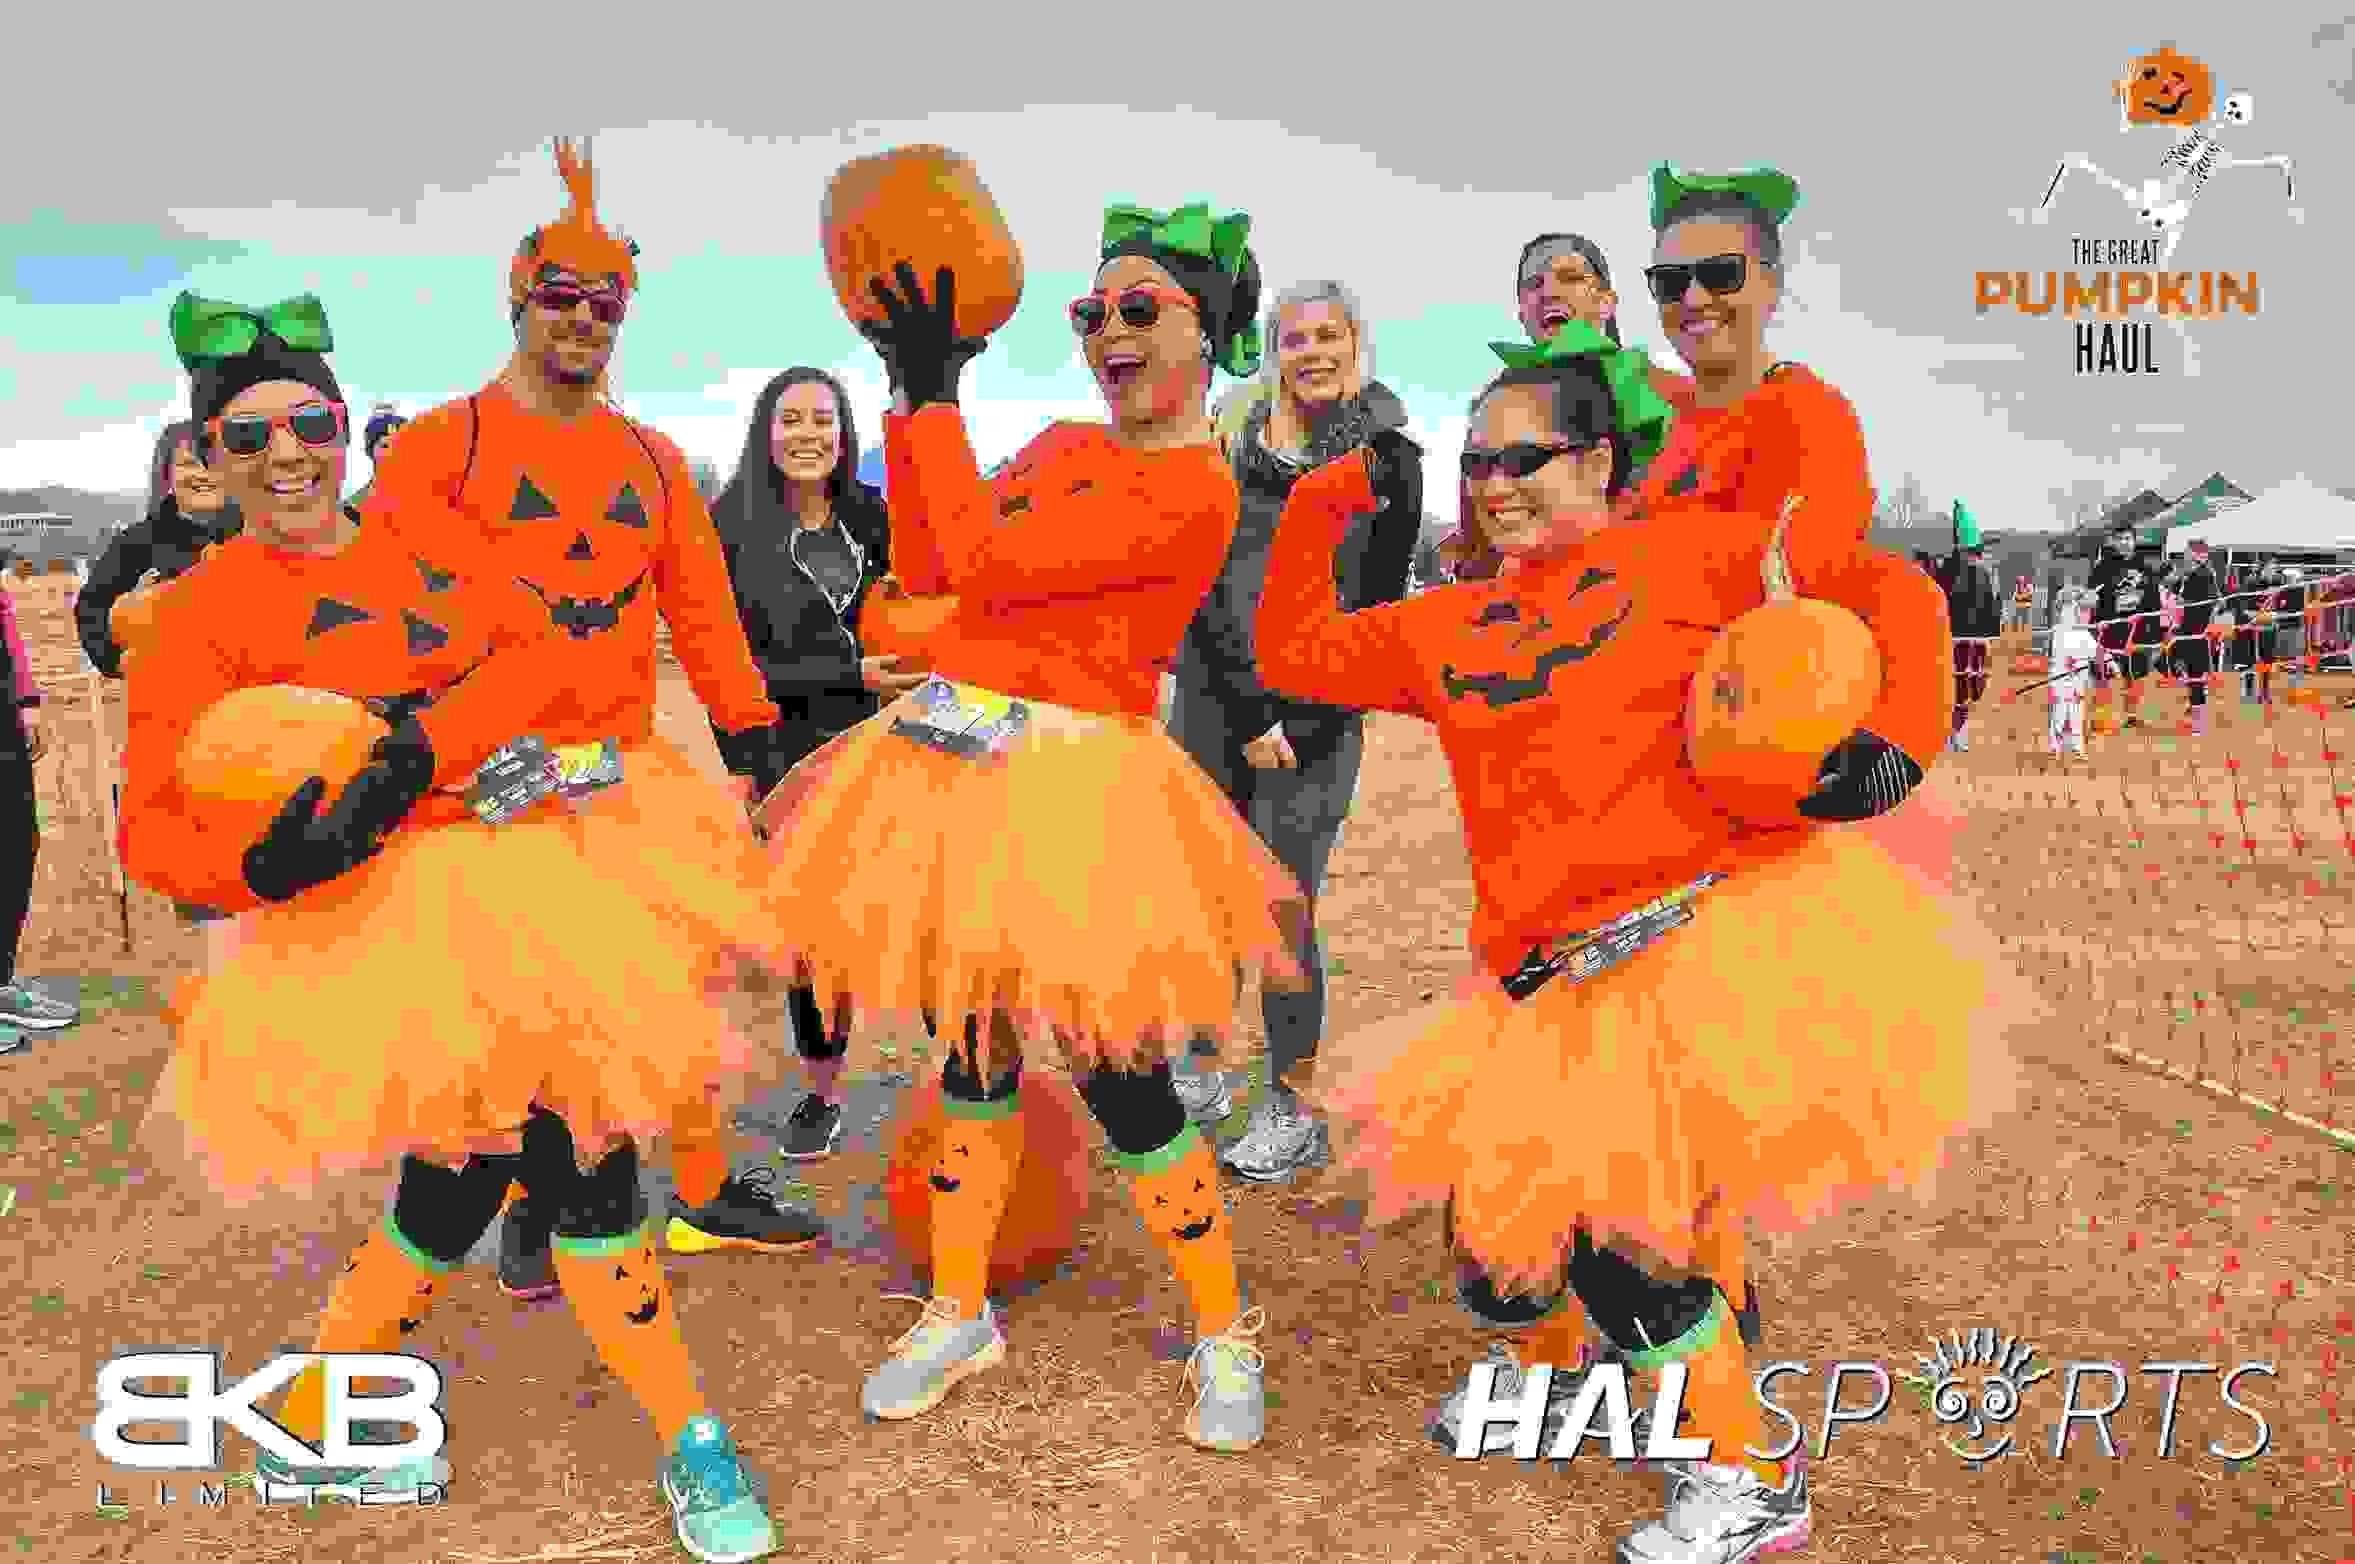 The Great Pumpkin Haul